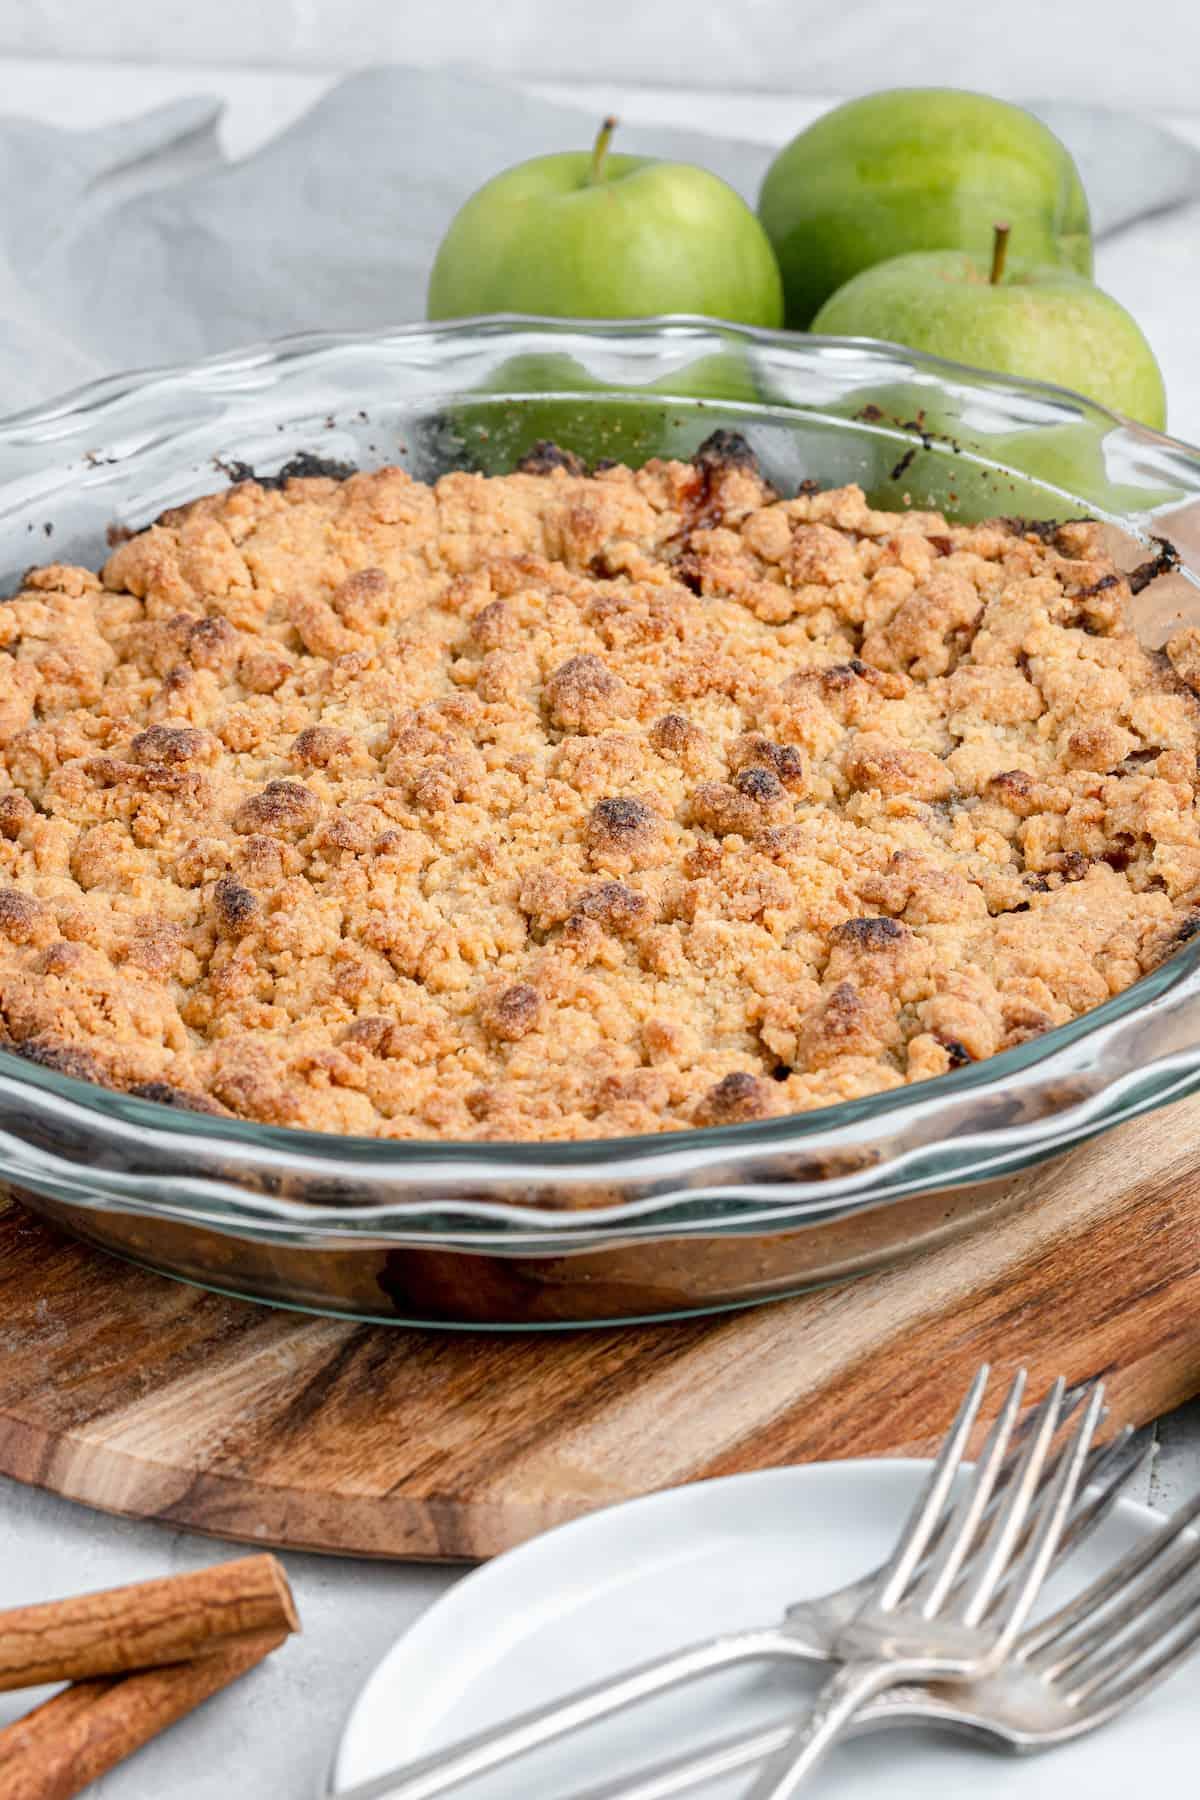 golden baked dutch apple pie in a glass pie plate